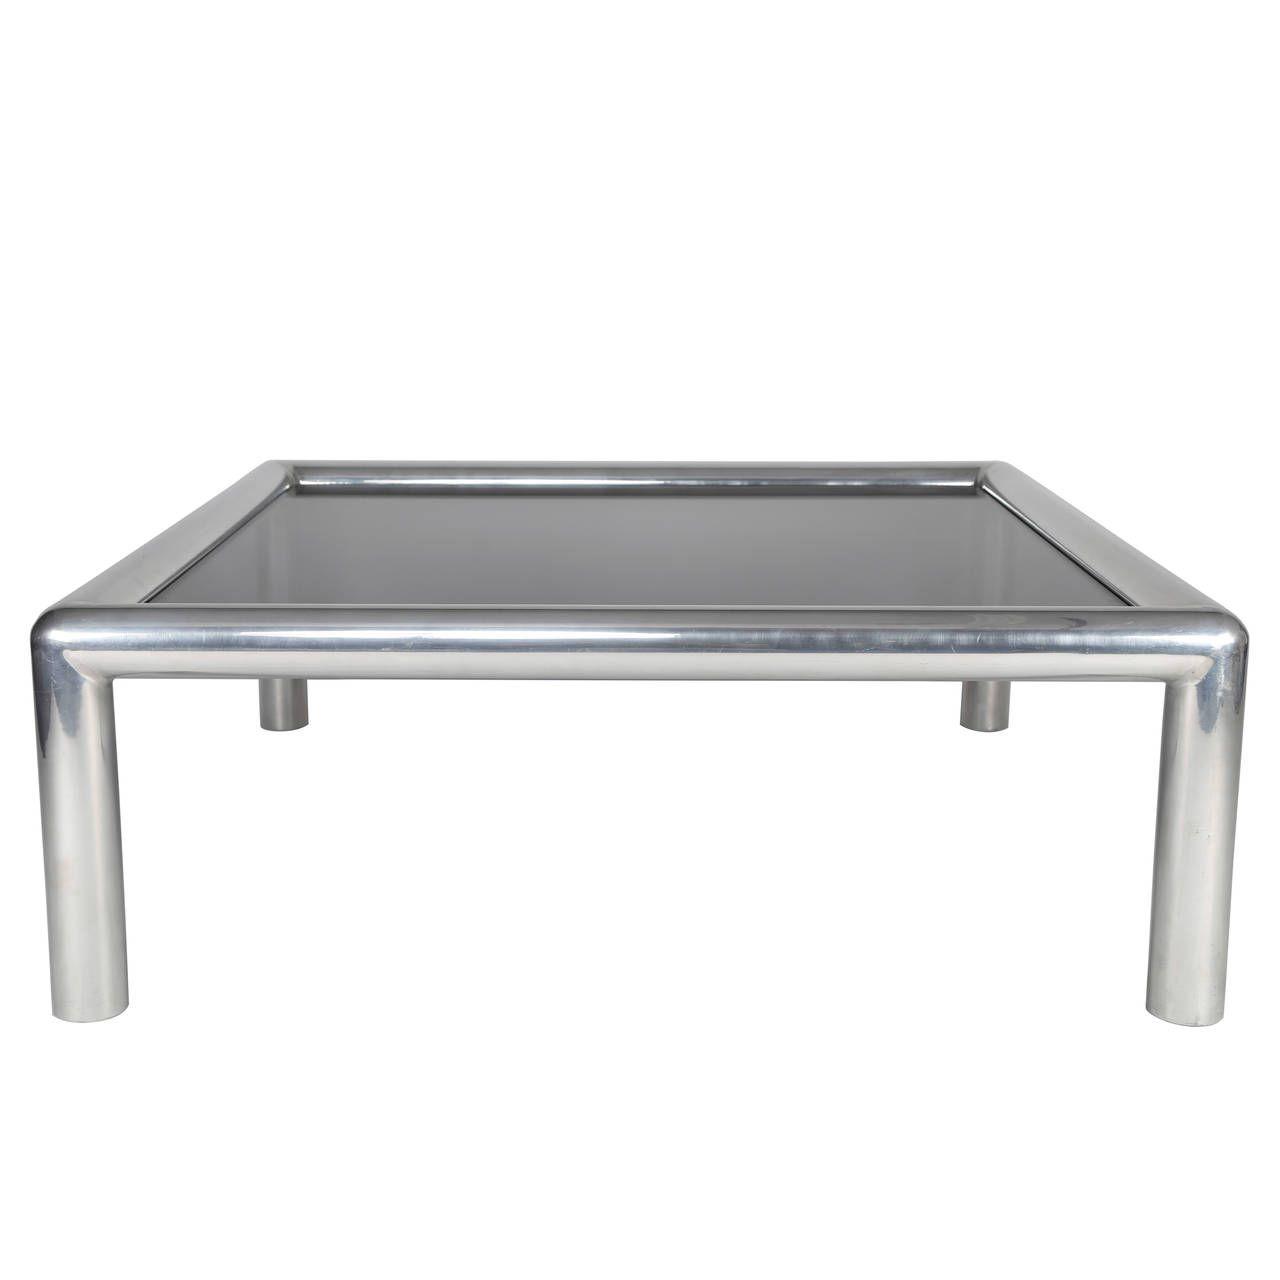 John Mascheroni Tubo Coffee Table Coffee Table Table Smoked Glass [ 1280 x 1280 Pixel ]